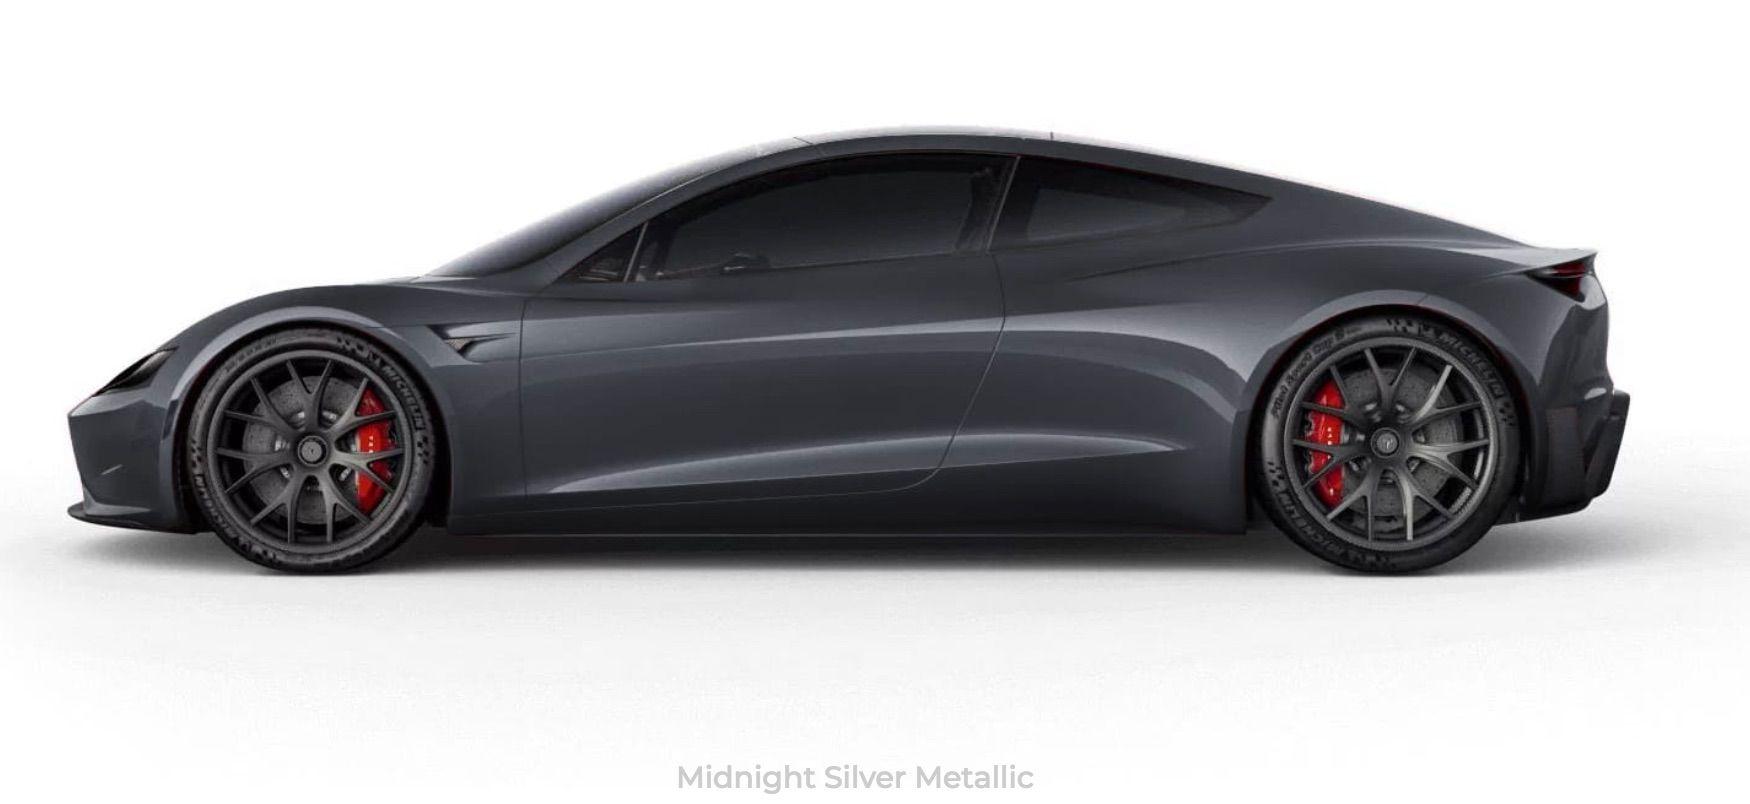 Https Www Theverge Com 2017 11 17 16669024 Tesla Roadster 2017 Fastest Car Worldei Quyfwtmmb8kv8wwx1jhwbw Q Tesla Roadster Oq Tesla Tesla Tesla Car Roadsters